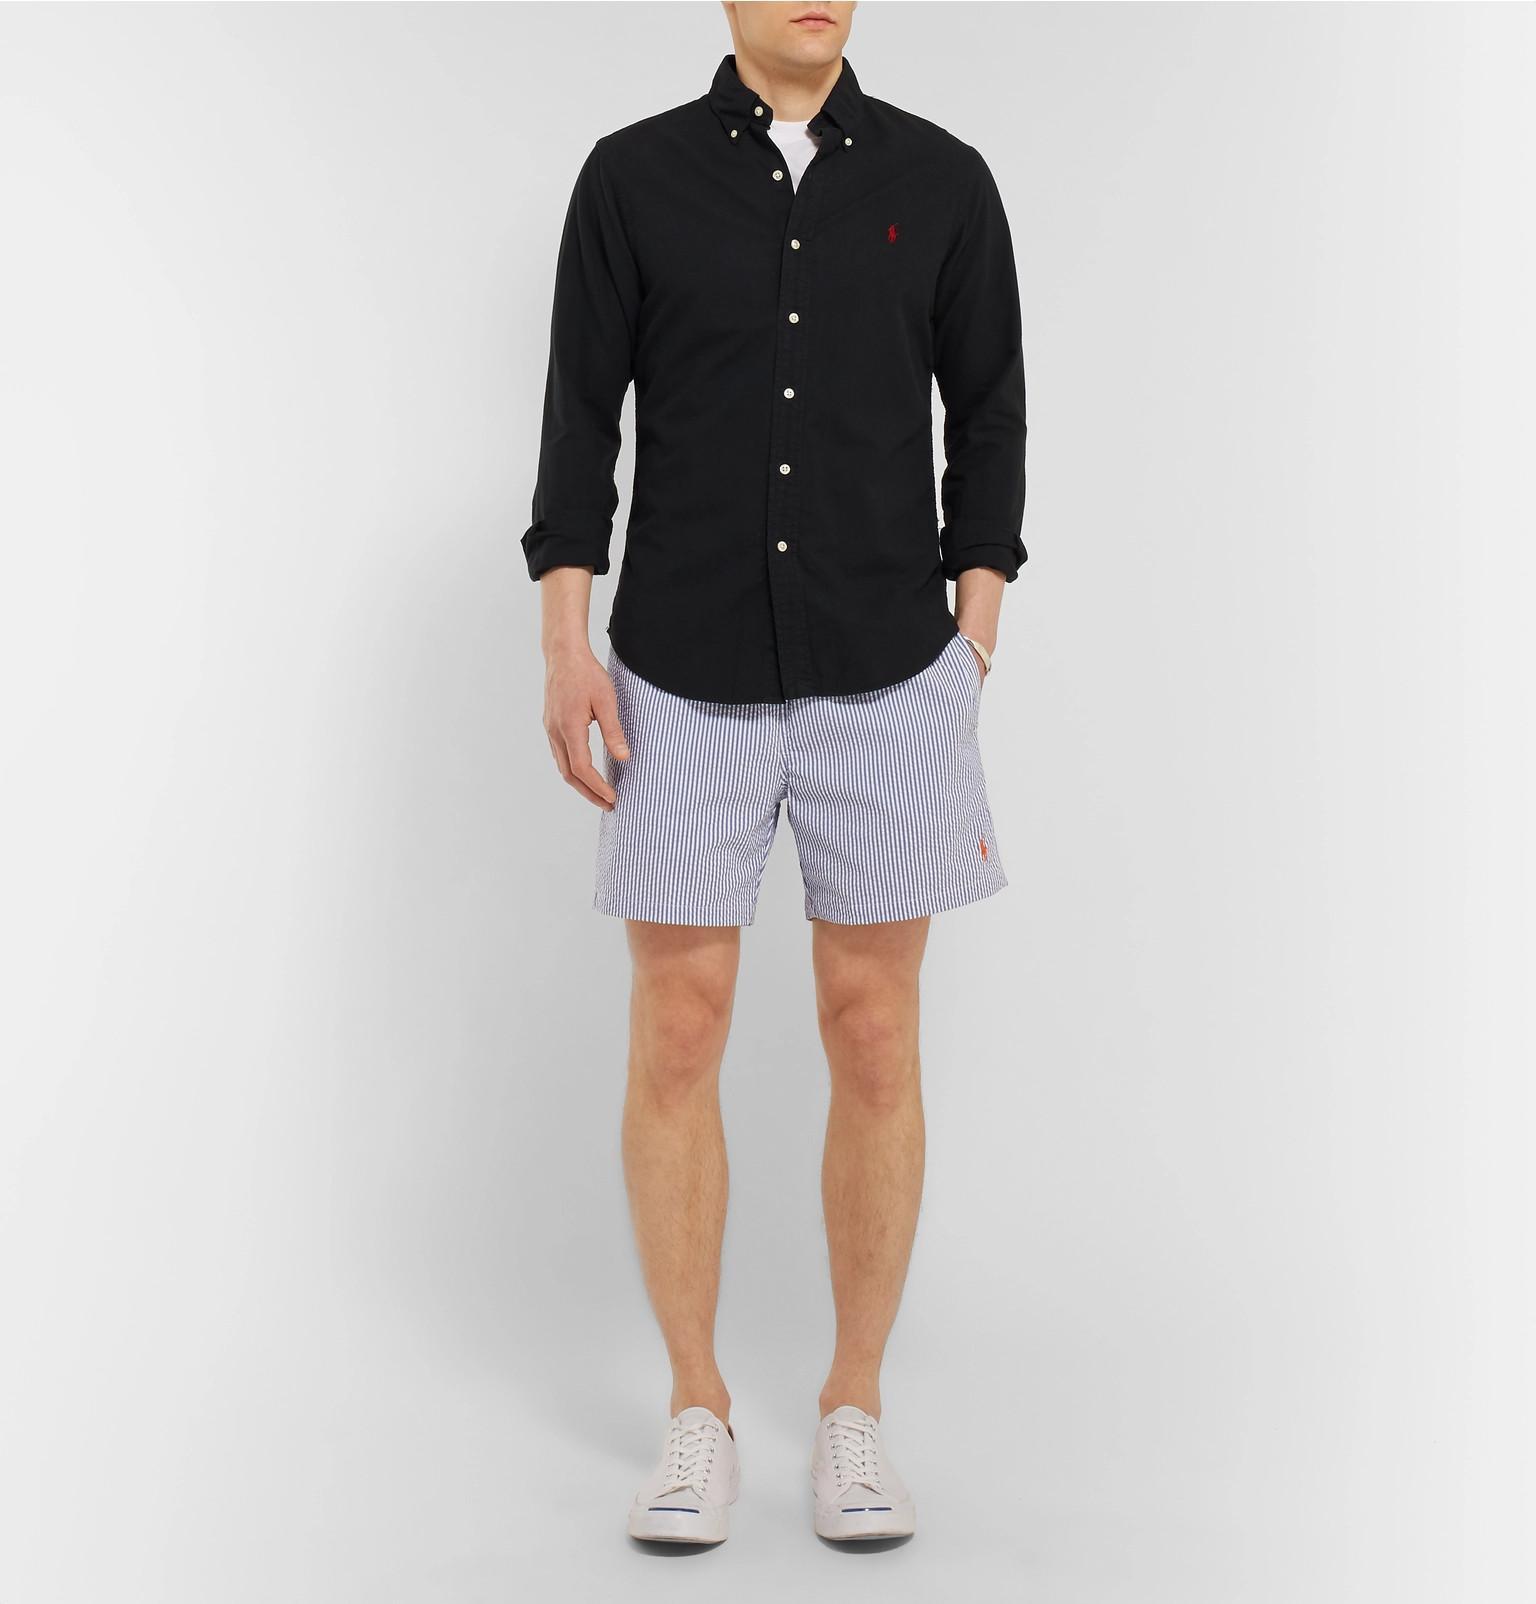 d80c3e0712 Polo Ralph Lauren Mid-length Striped Cotton-blend Seersucker Swim ...